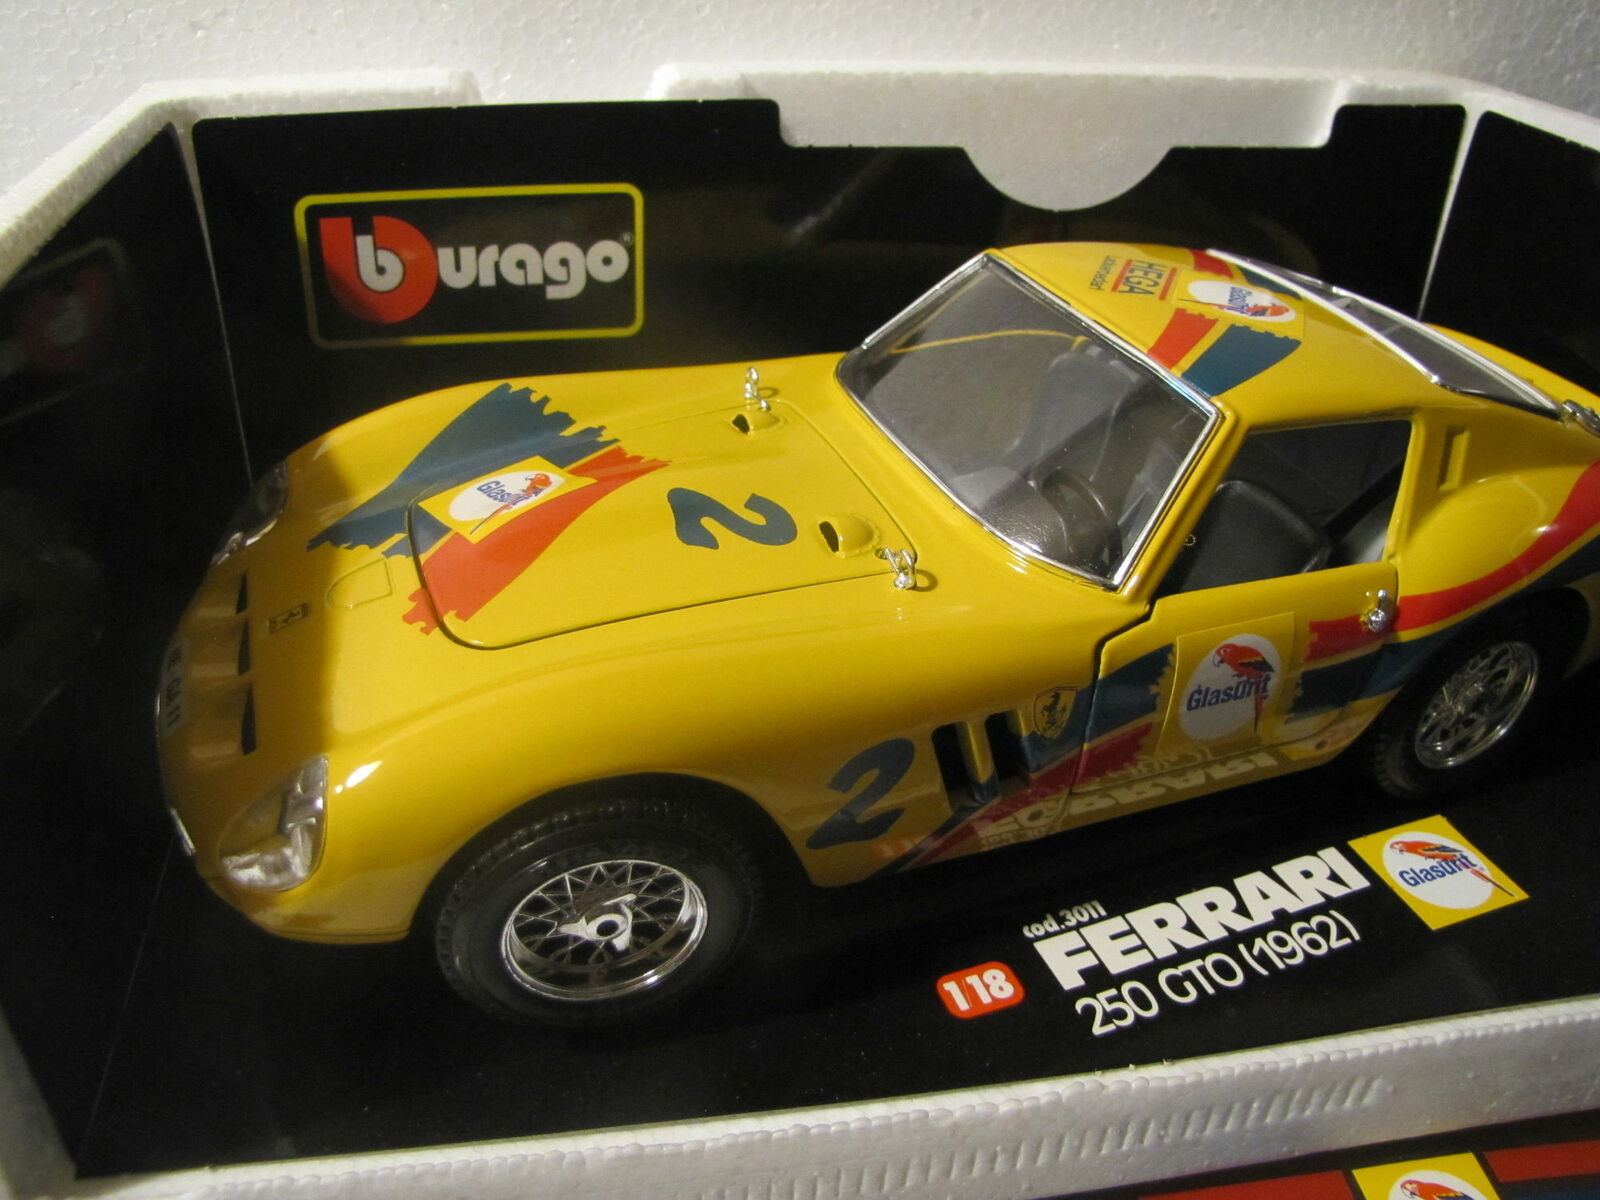 Ferrari 250 GTO    Glasurit   1 18   Bburago   08-05   neuf dans sa boîte  livraison gratuite